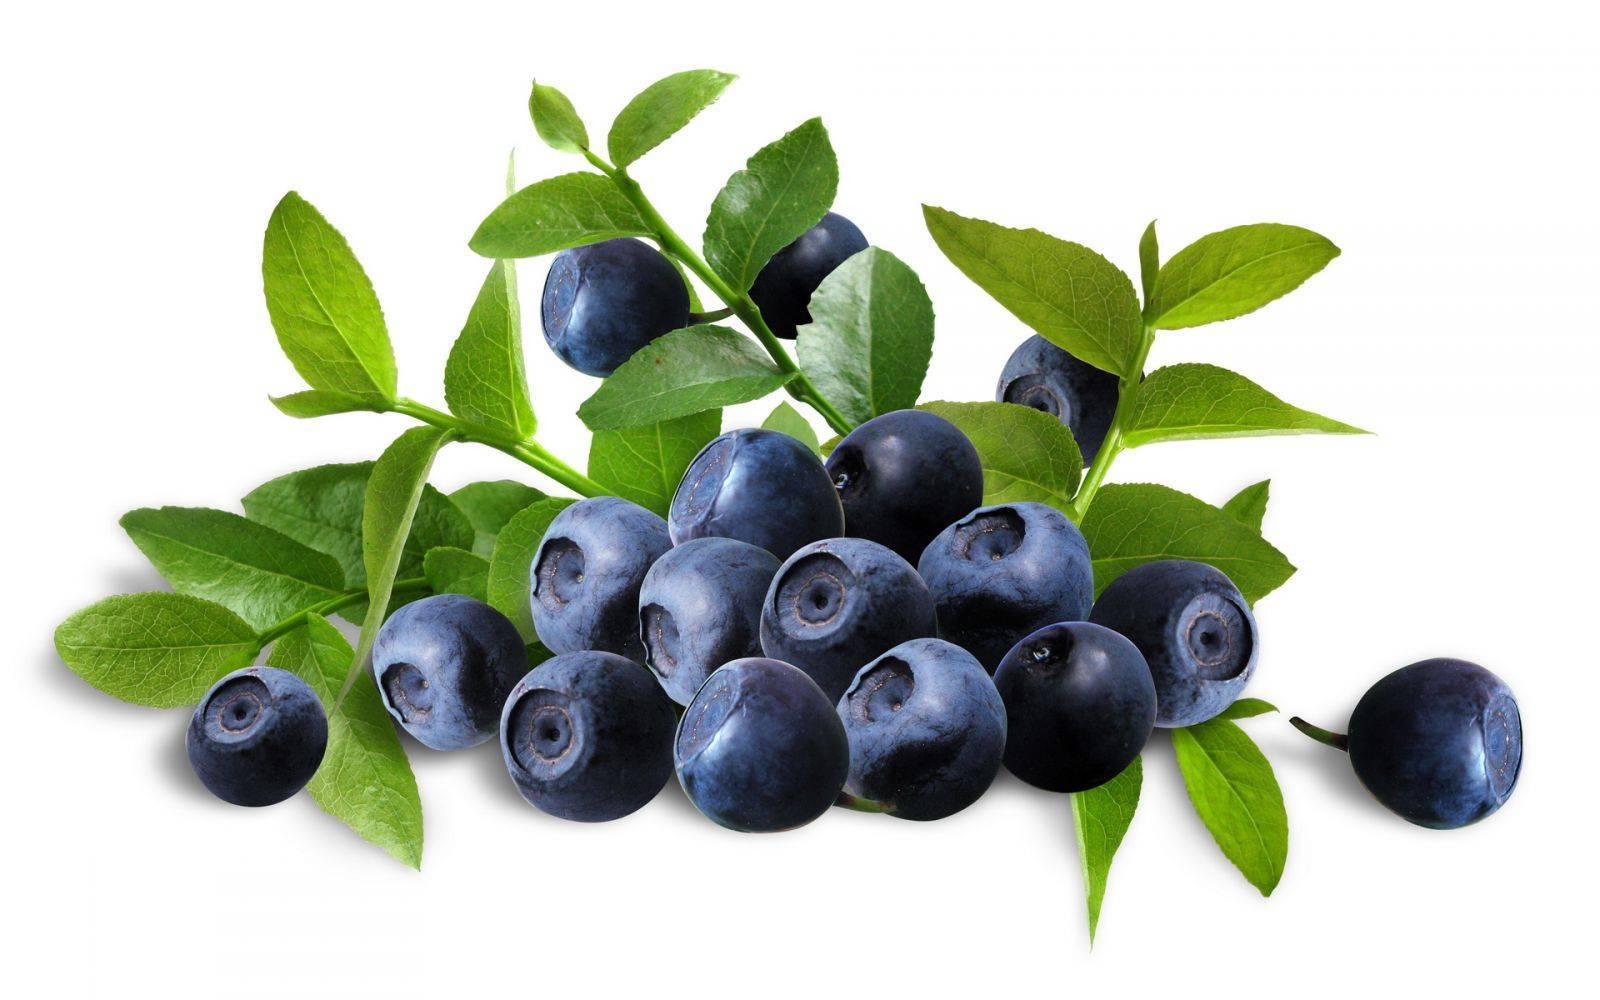 Frozen blackberry - bilberry (Vaccínium myrtíllus)